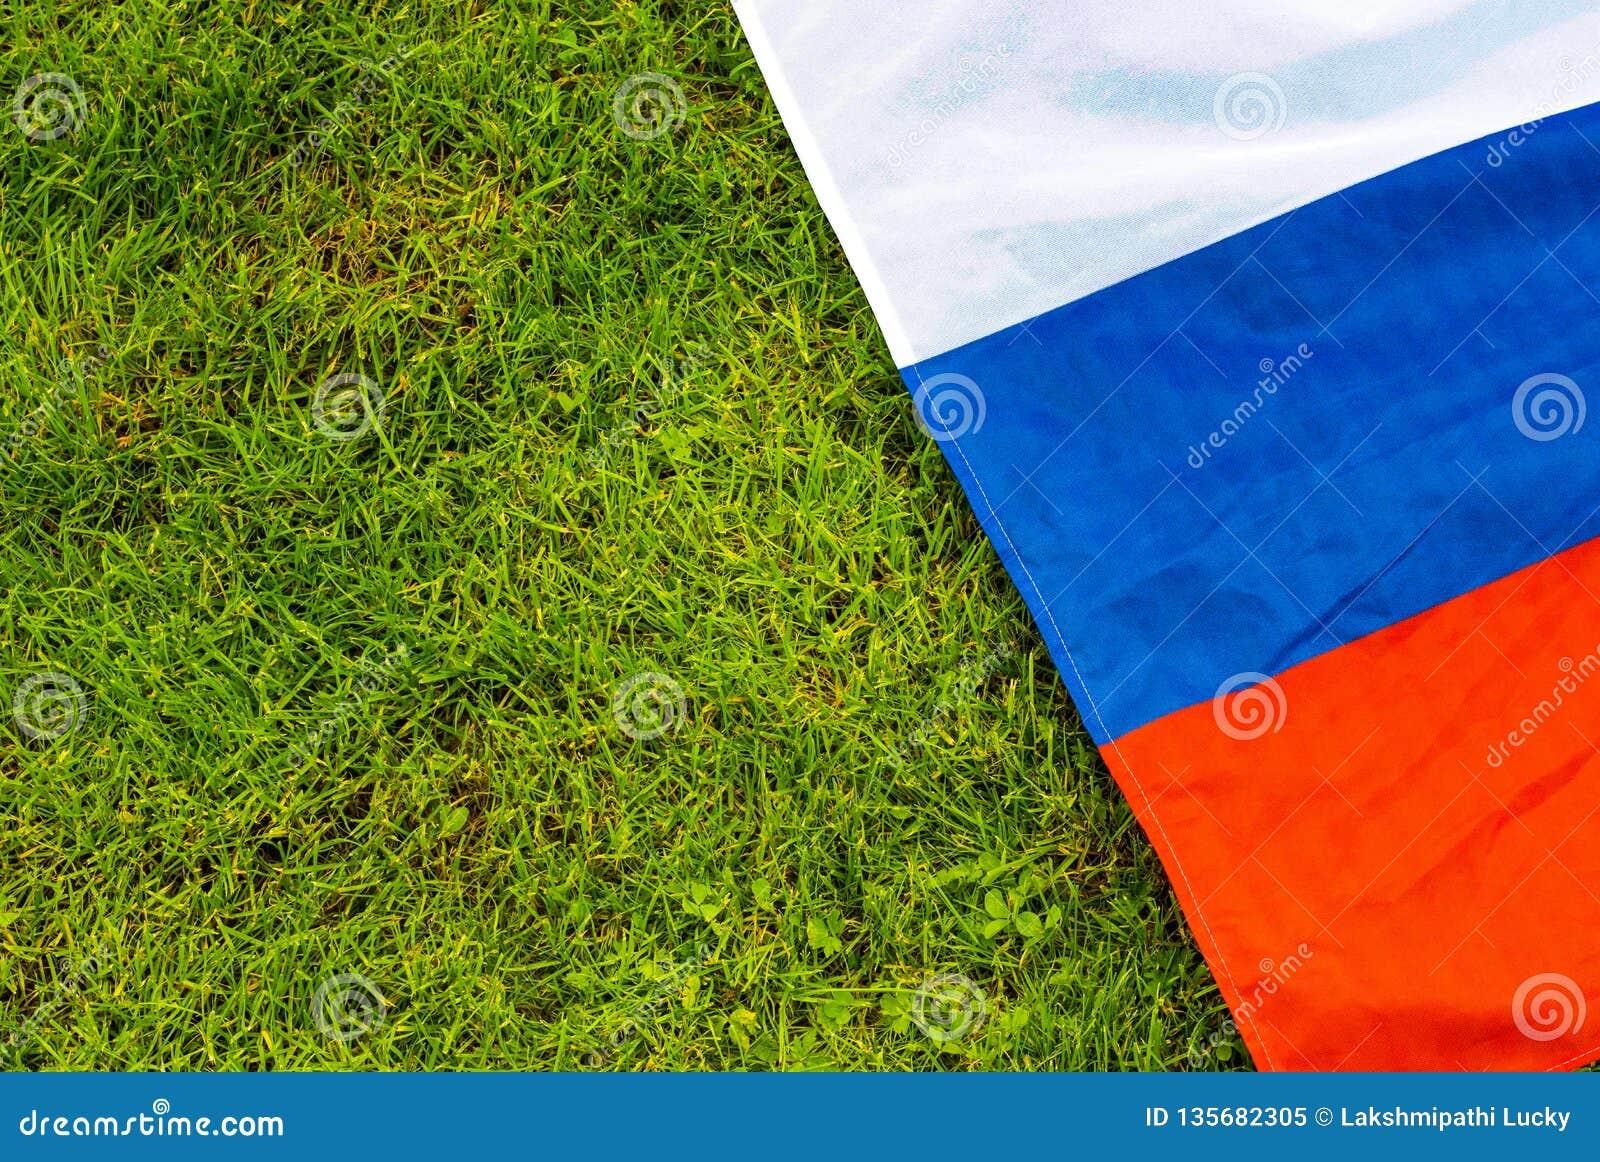 Flag on football court pitch grass pole lines closeup